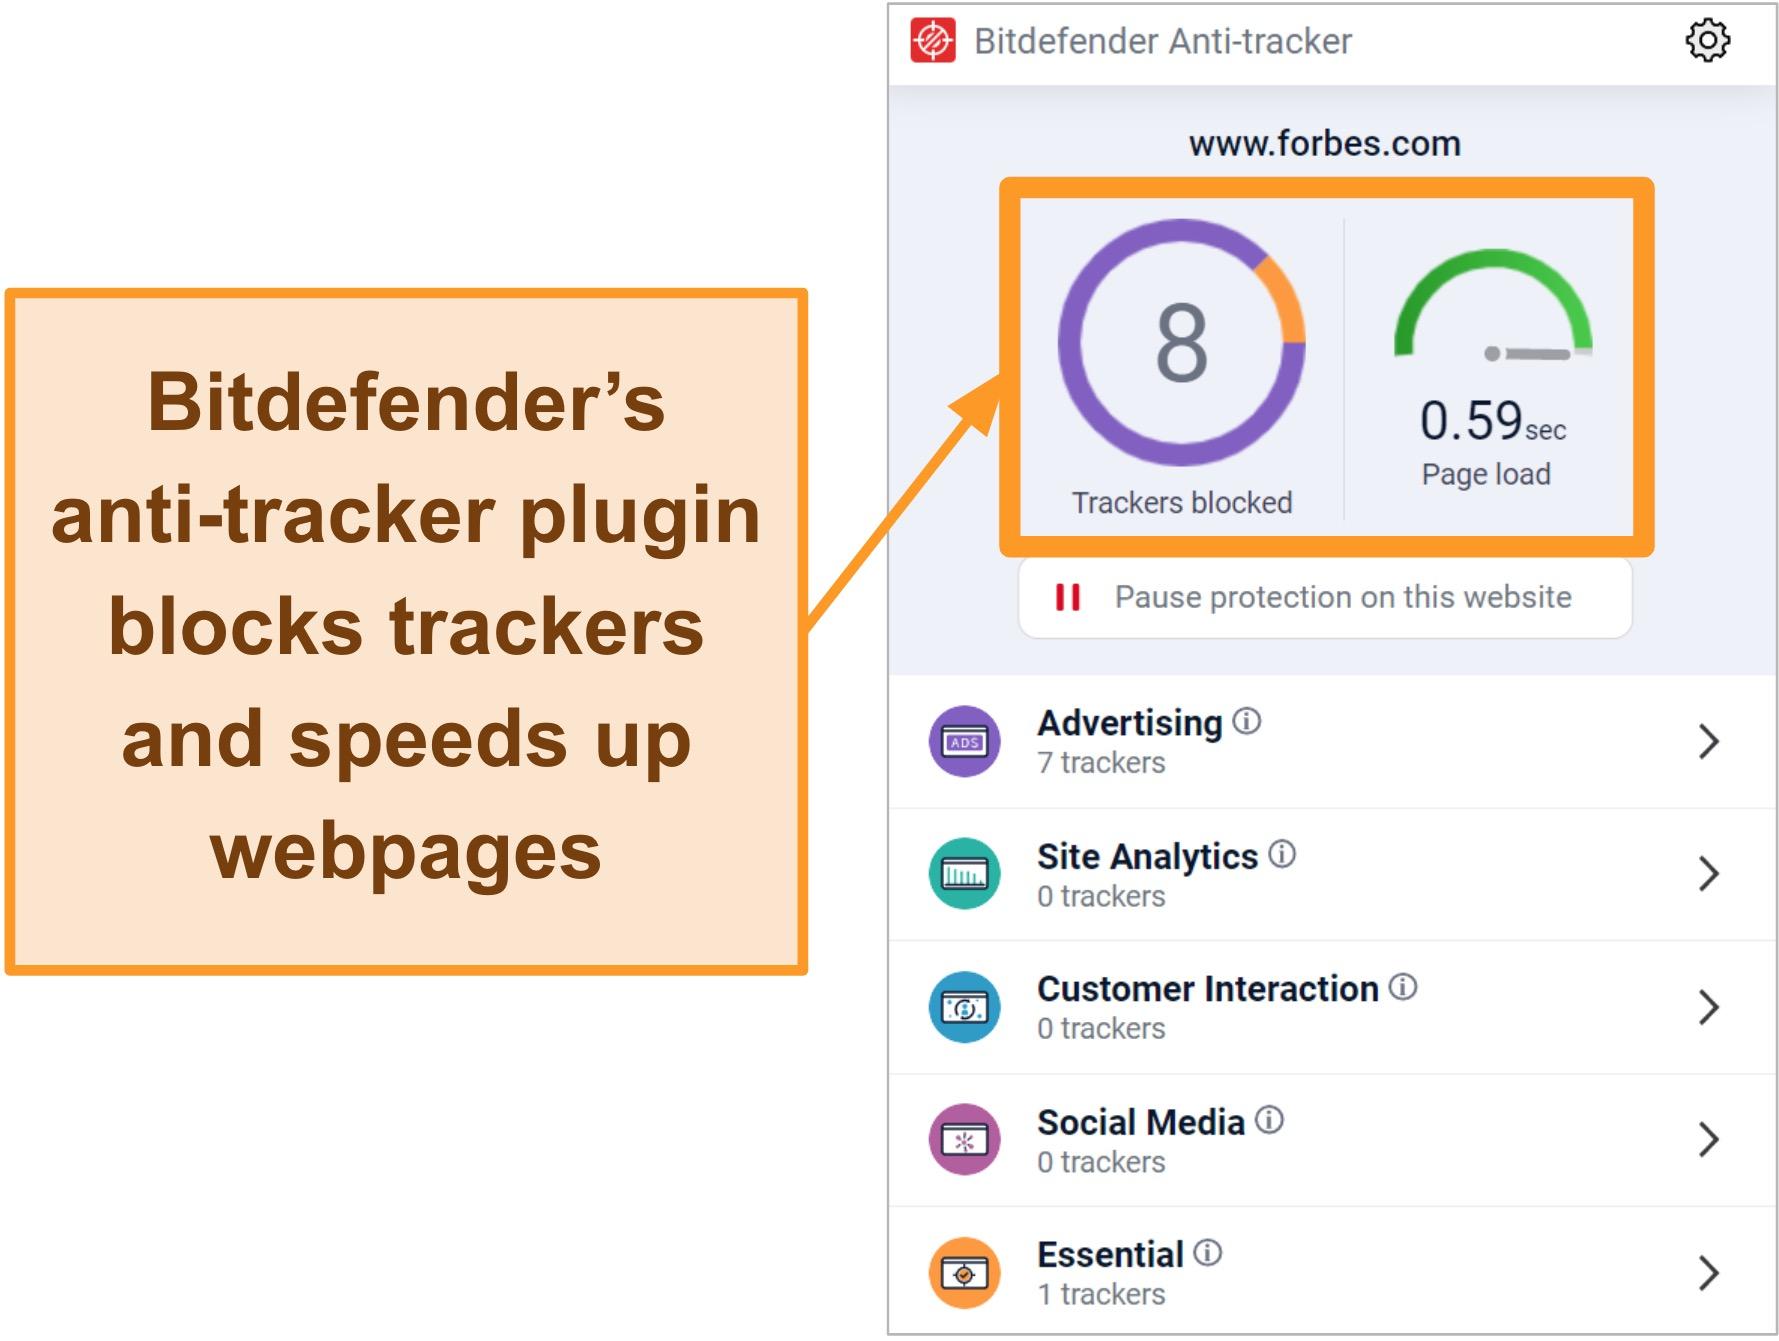 Screenshot of Bitdefender's anti-tracker browser plugin